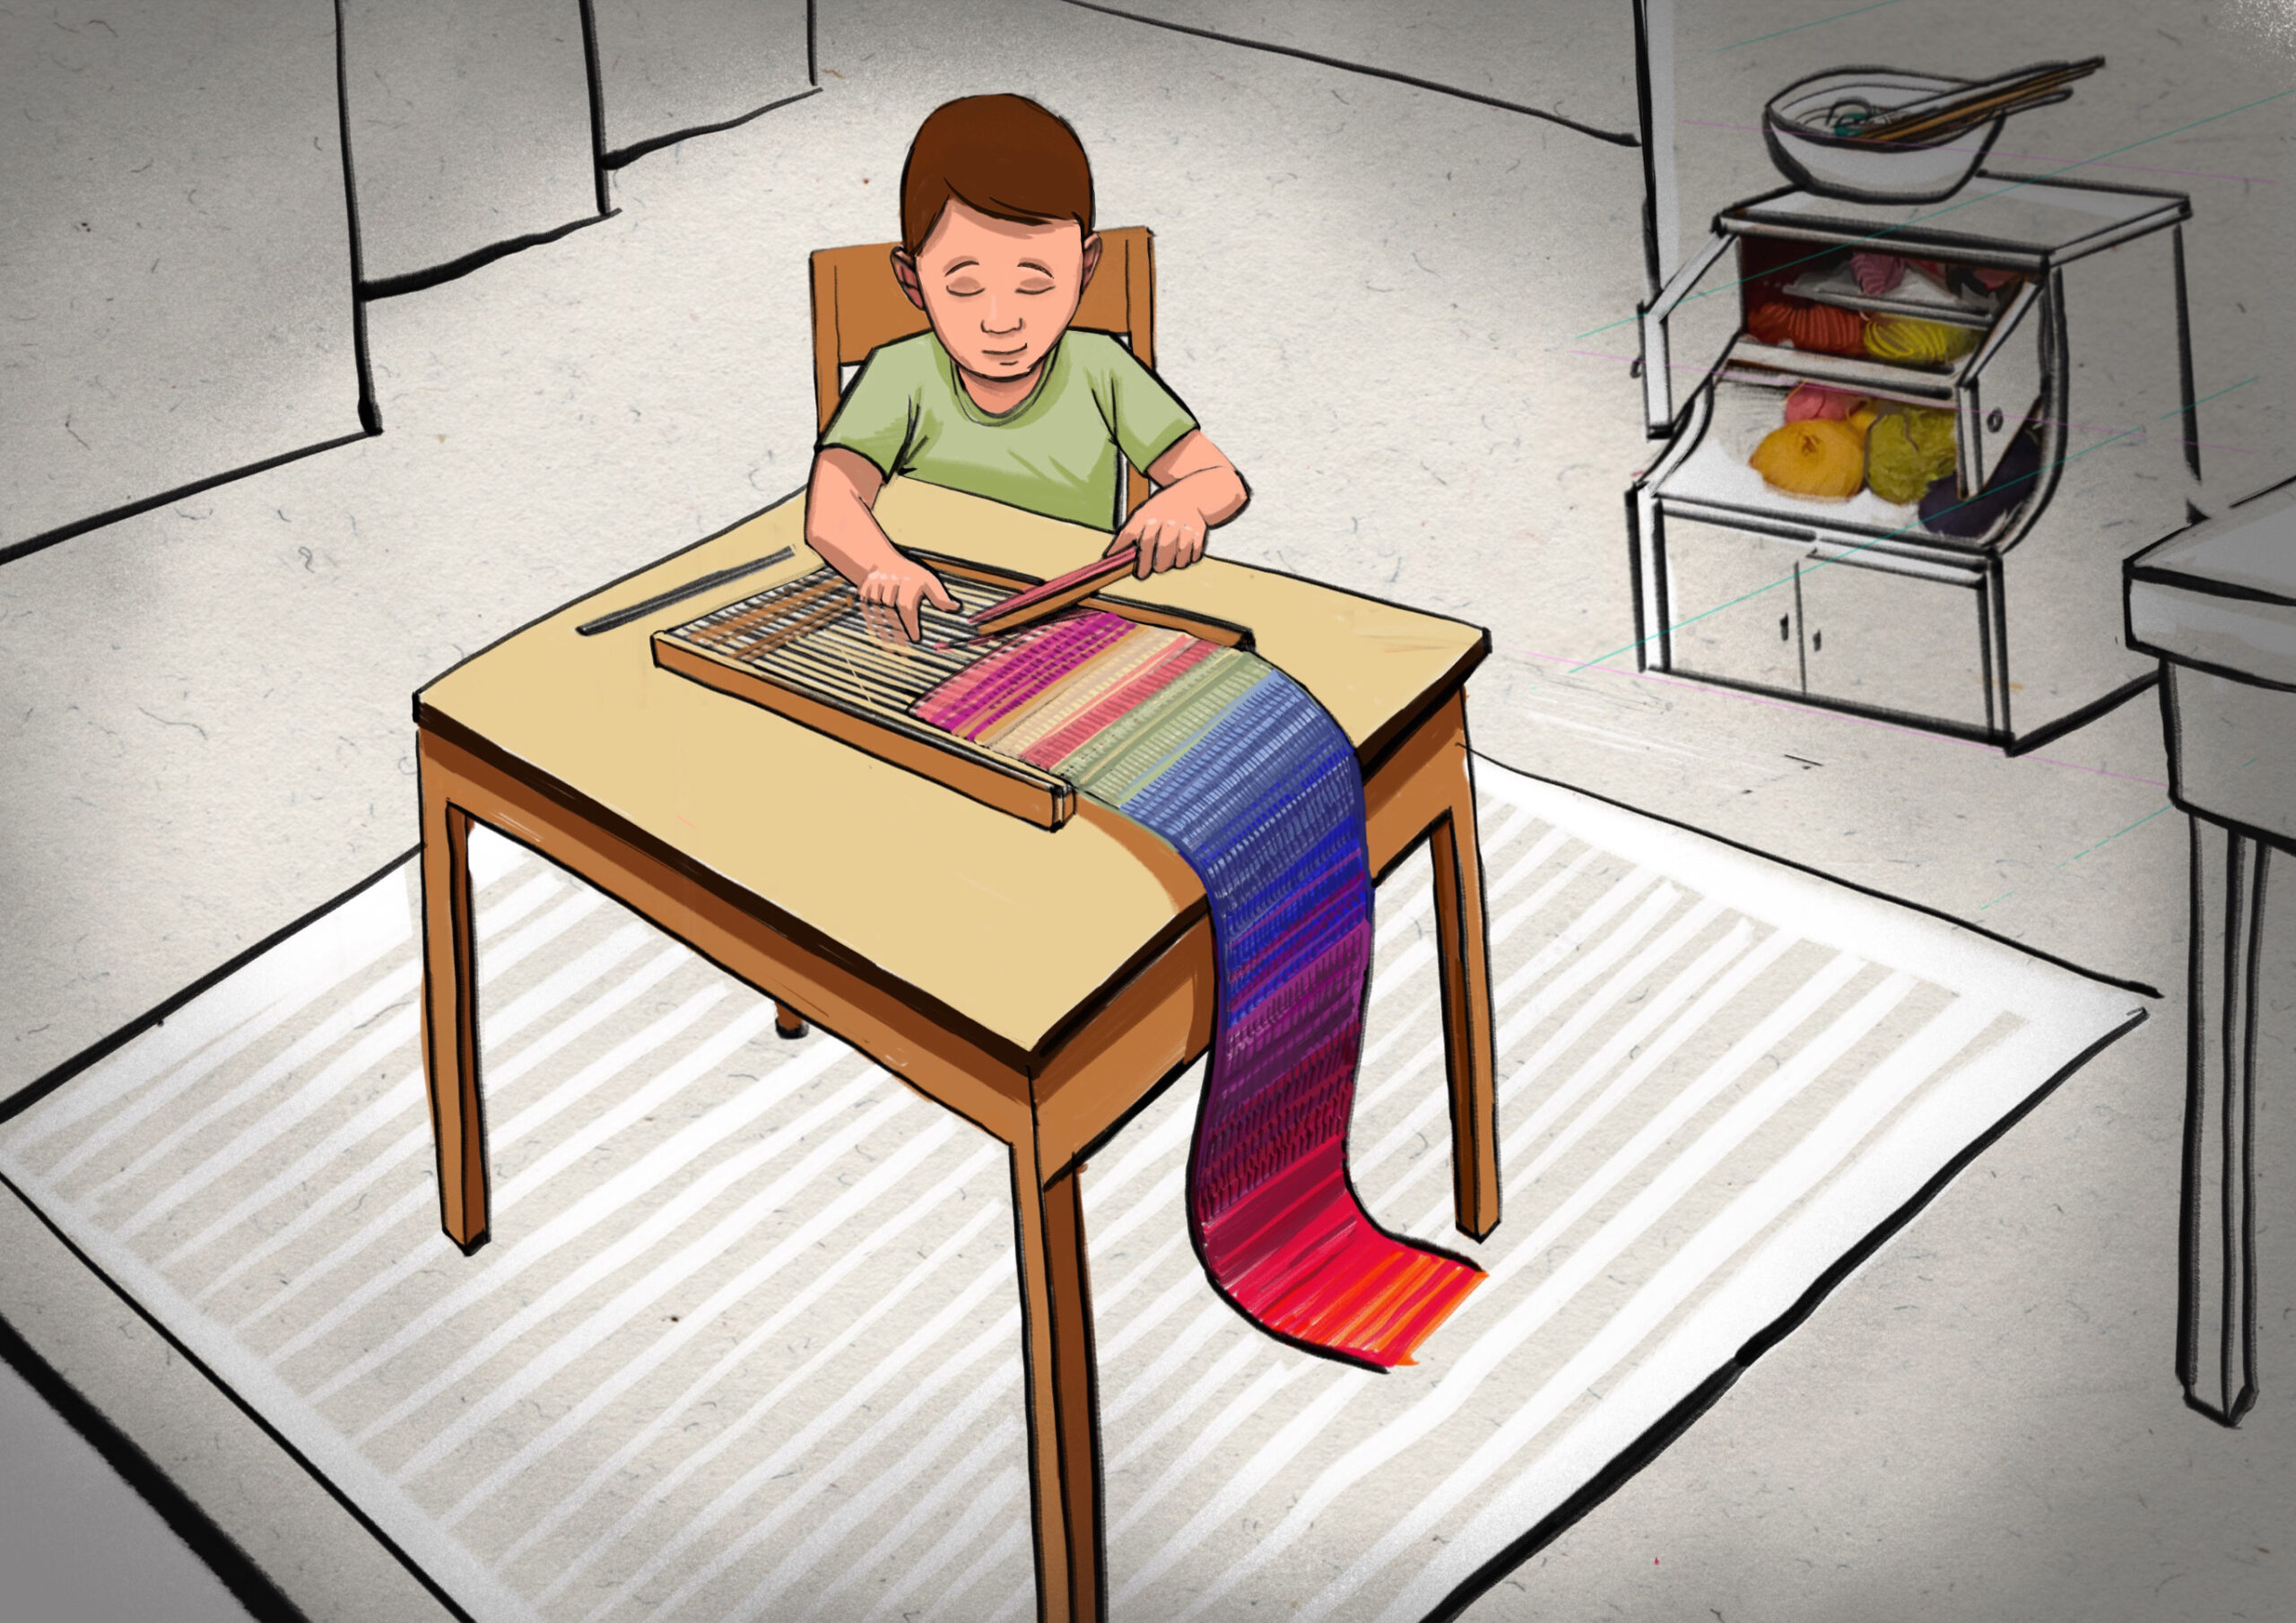 Textilwerkstatt - Junge an Webrahmen 3 - Schal